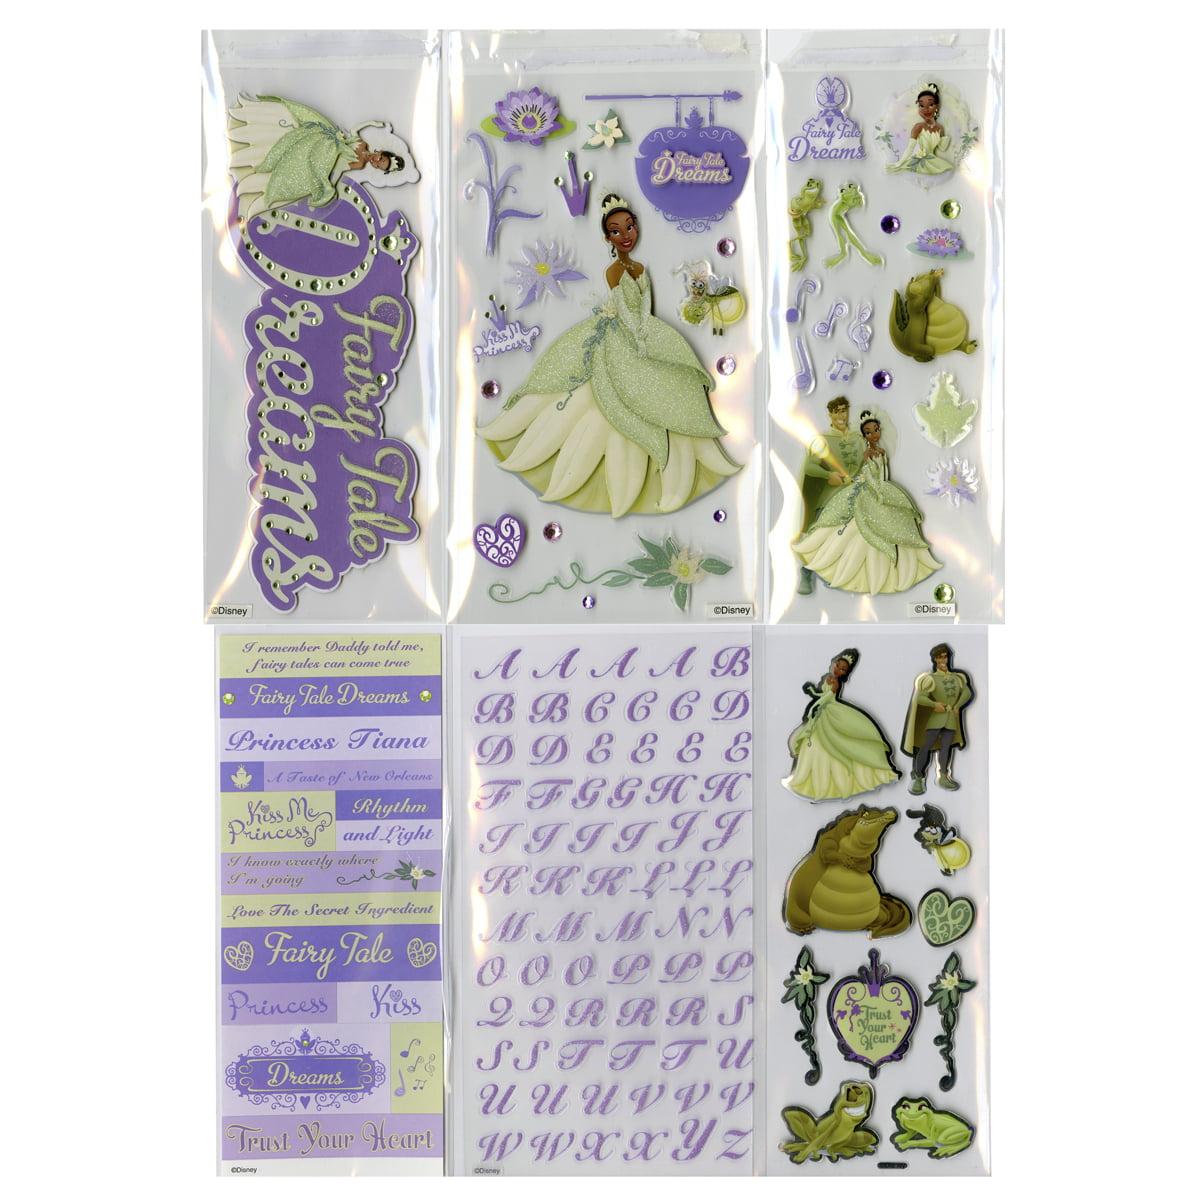 Disney Value Sticker Set - 4 Dimensional & 2 Flat Sheets-Princess & The Frog